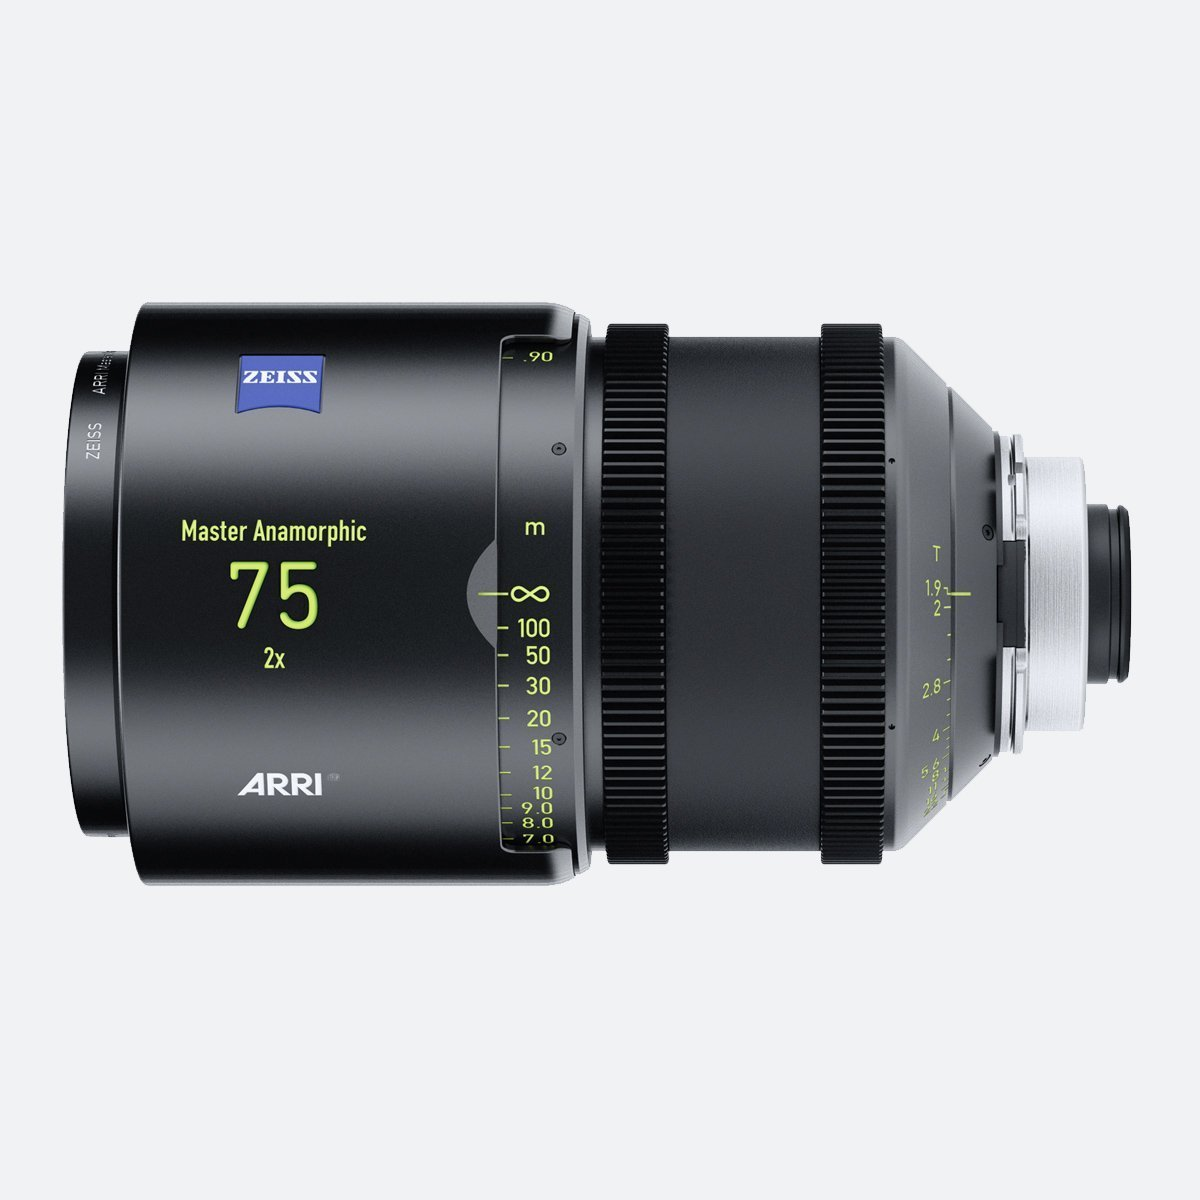 ARRI 75mm T1.9 Master Anamorphic Lens